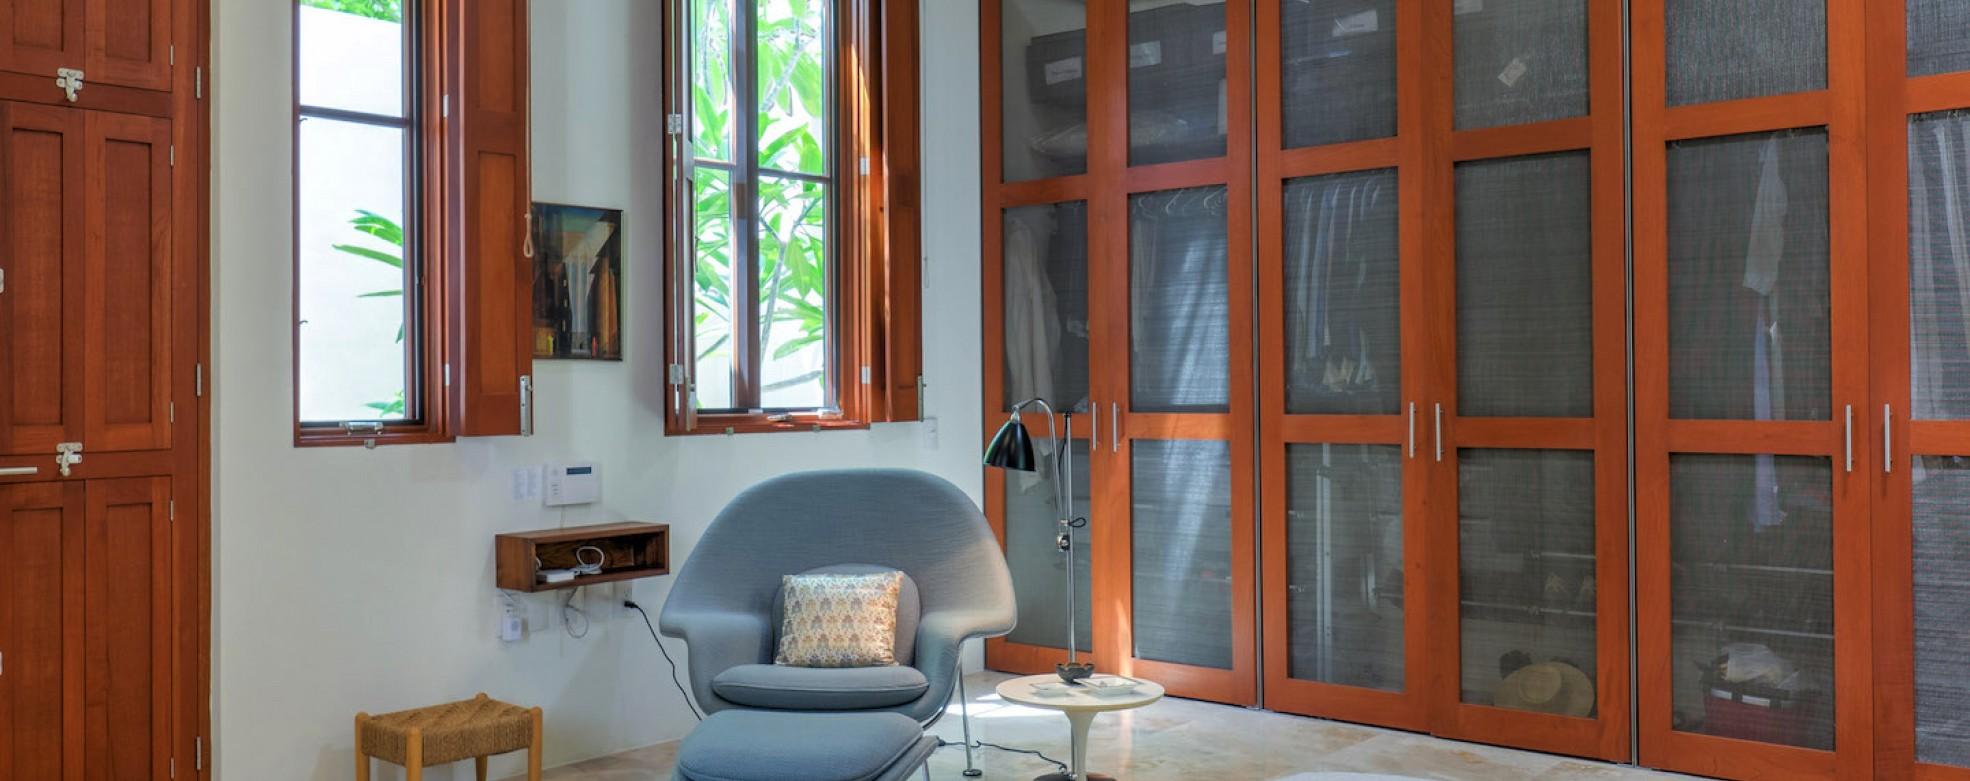 Spectacular Architect Design In Merida Centro Yucatan Real Estate We Know Yucatan Merida Mexico Real Estate